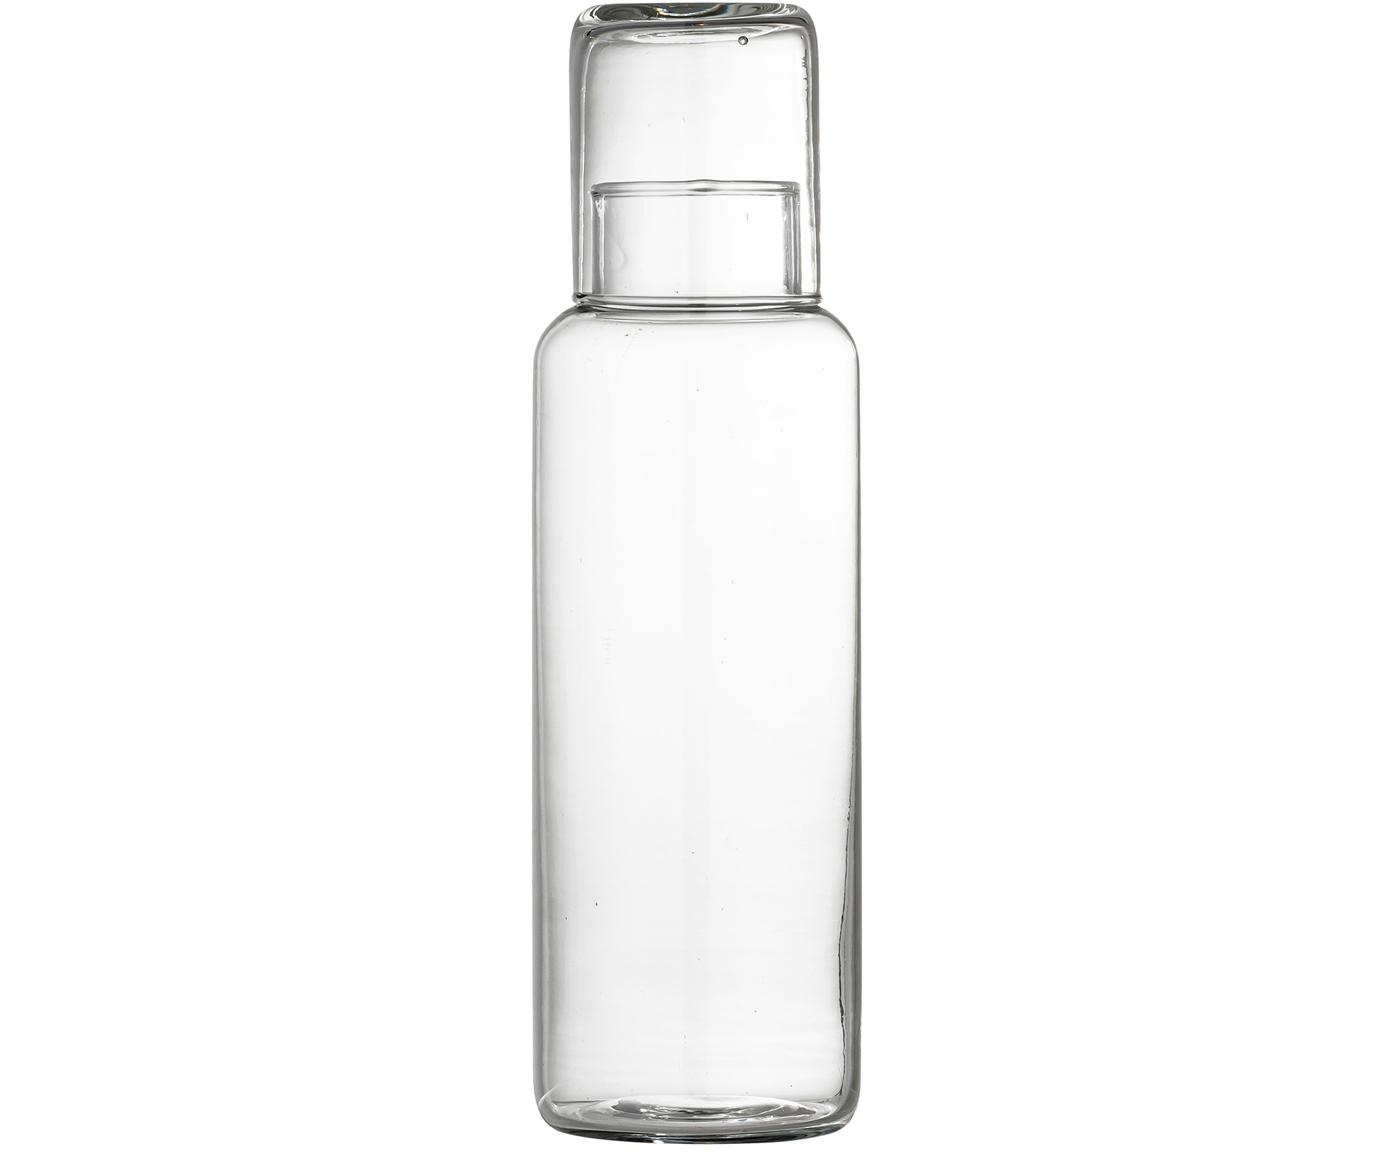 Karaffe Luna mit Trinkglas, Glas, Transparent, Sondergrößen